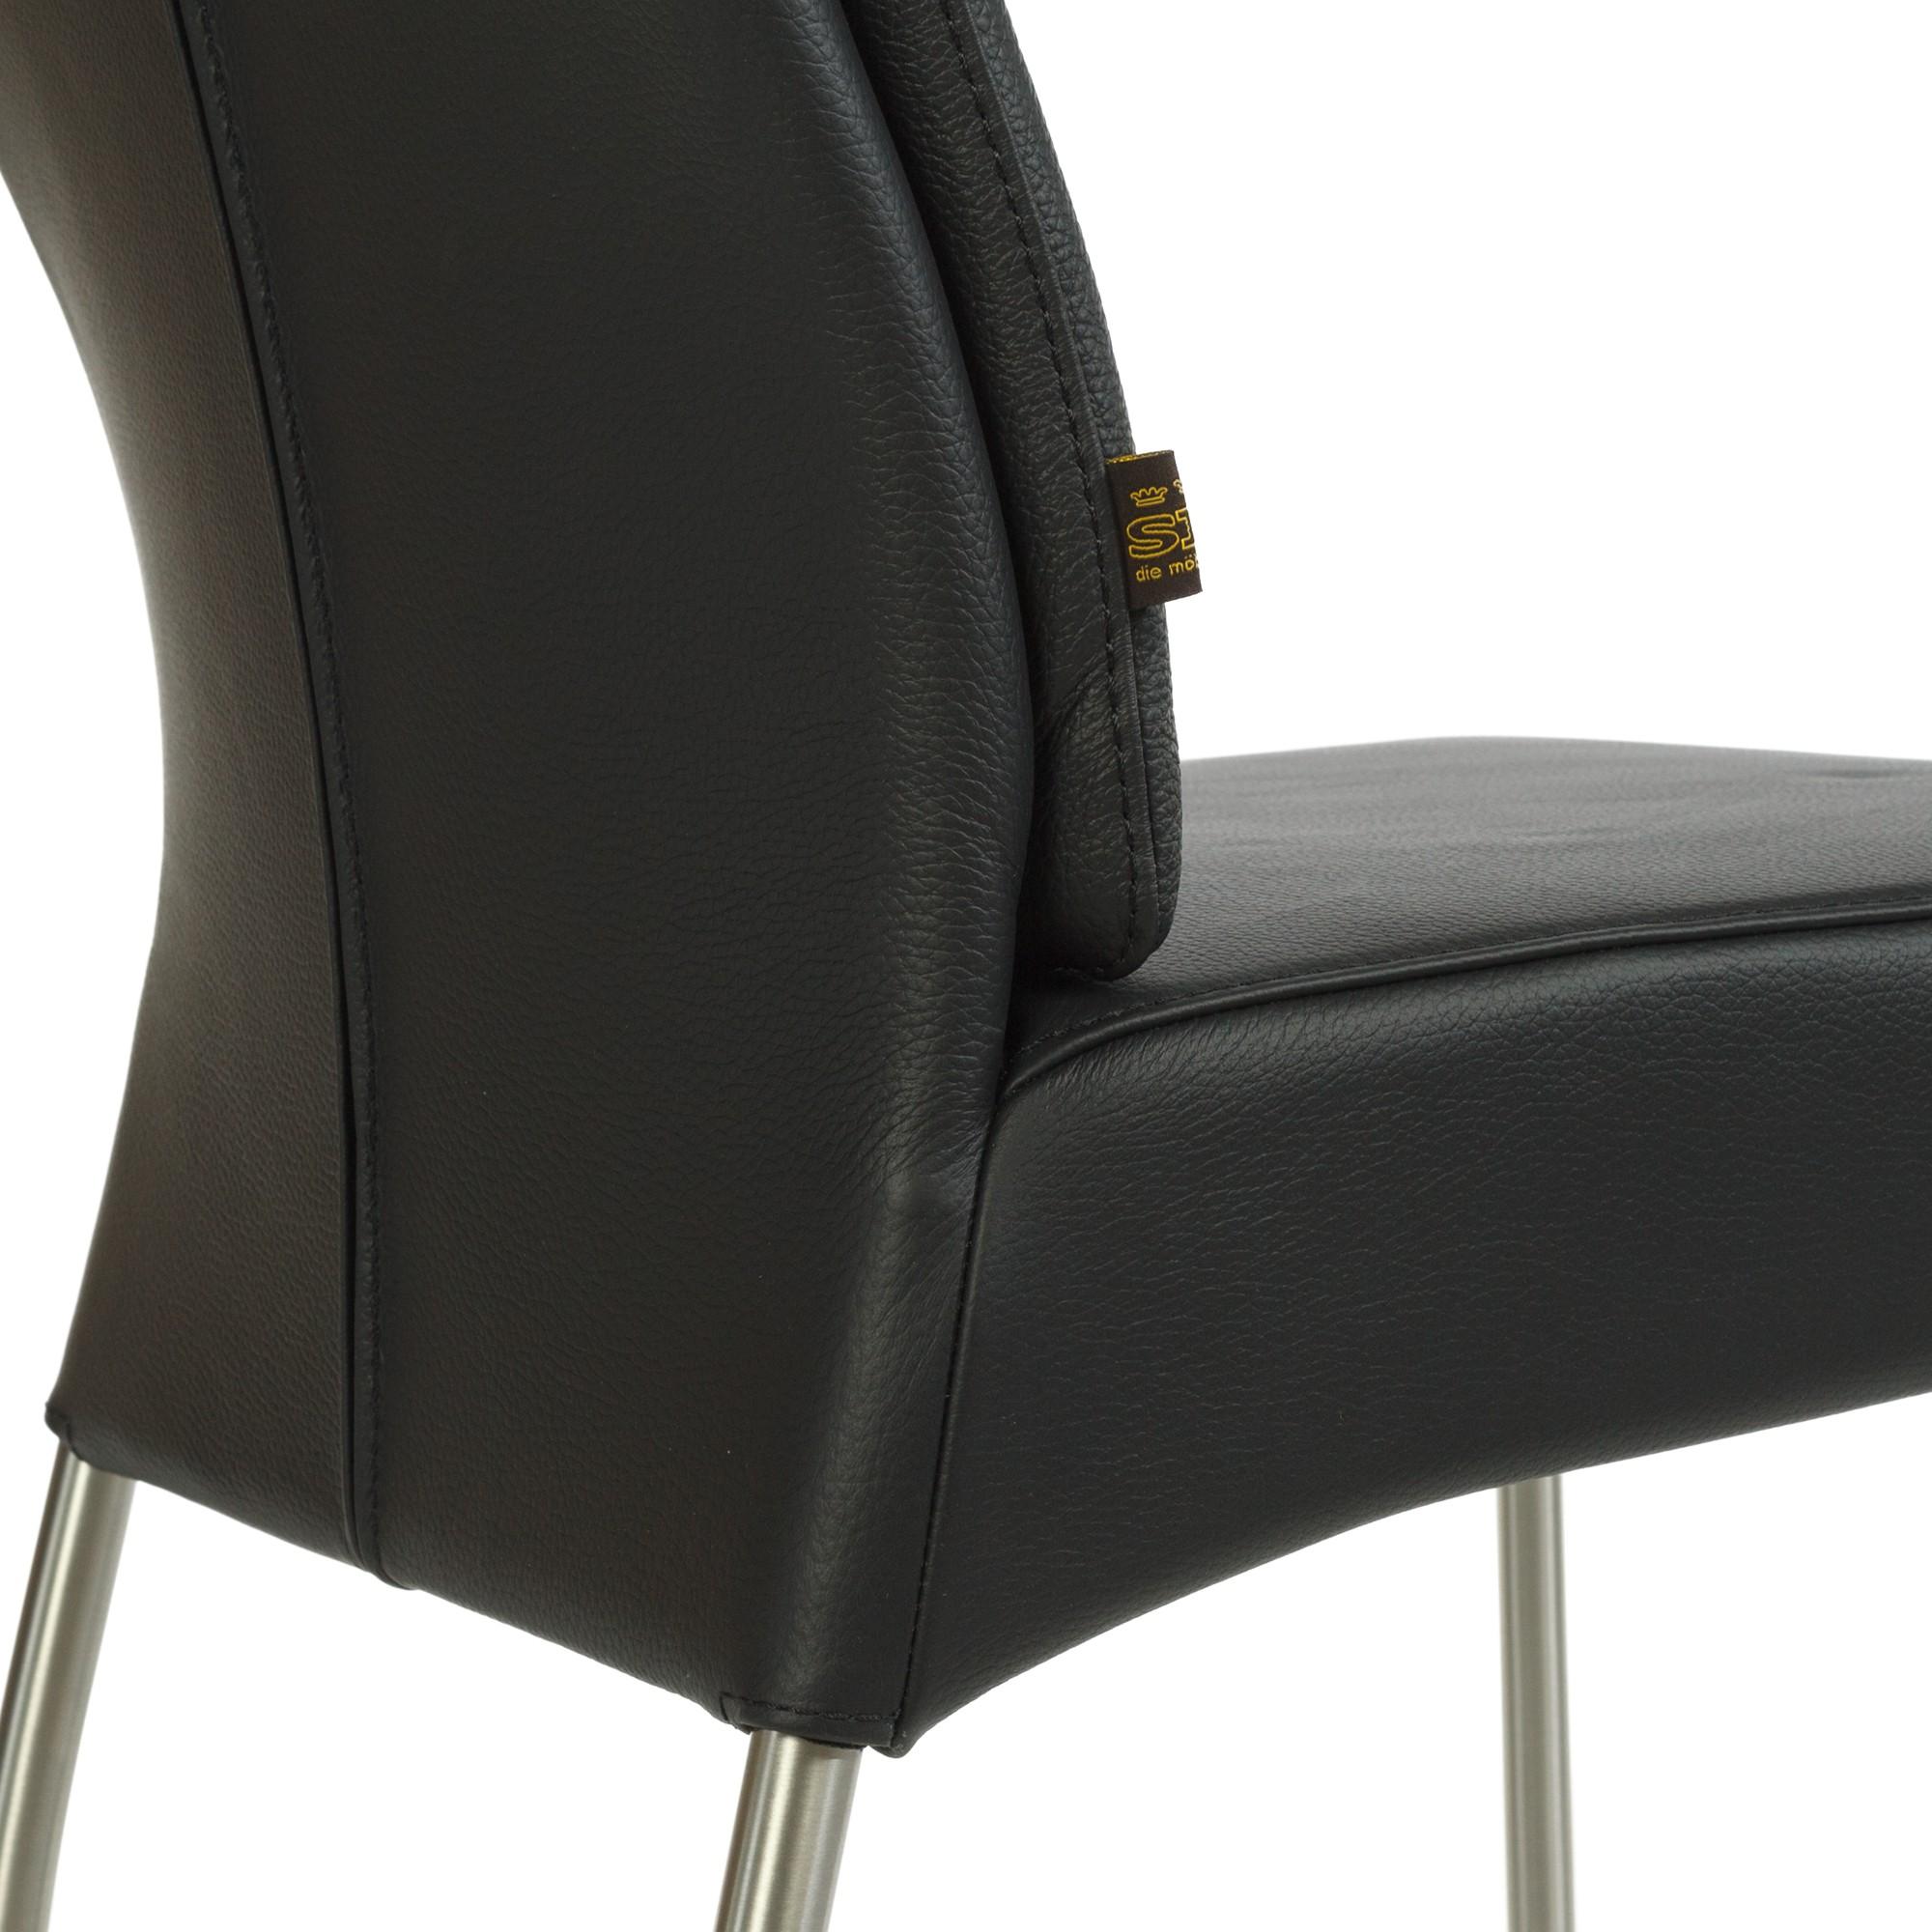 Lederstuhl gatto schwarz edelstahl - Lederstuhl design ...